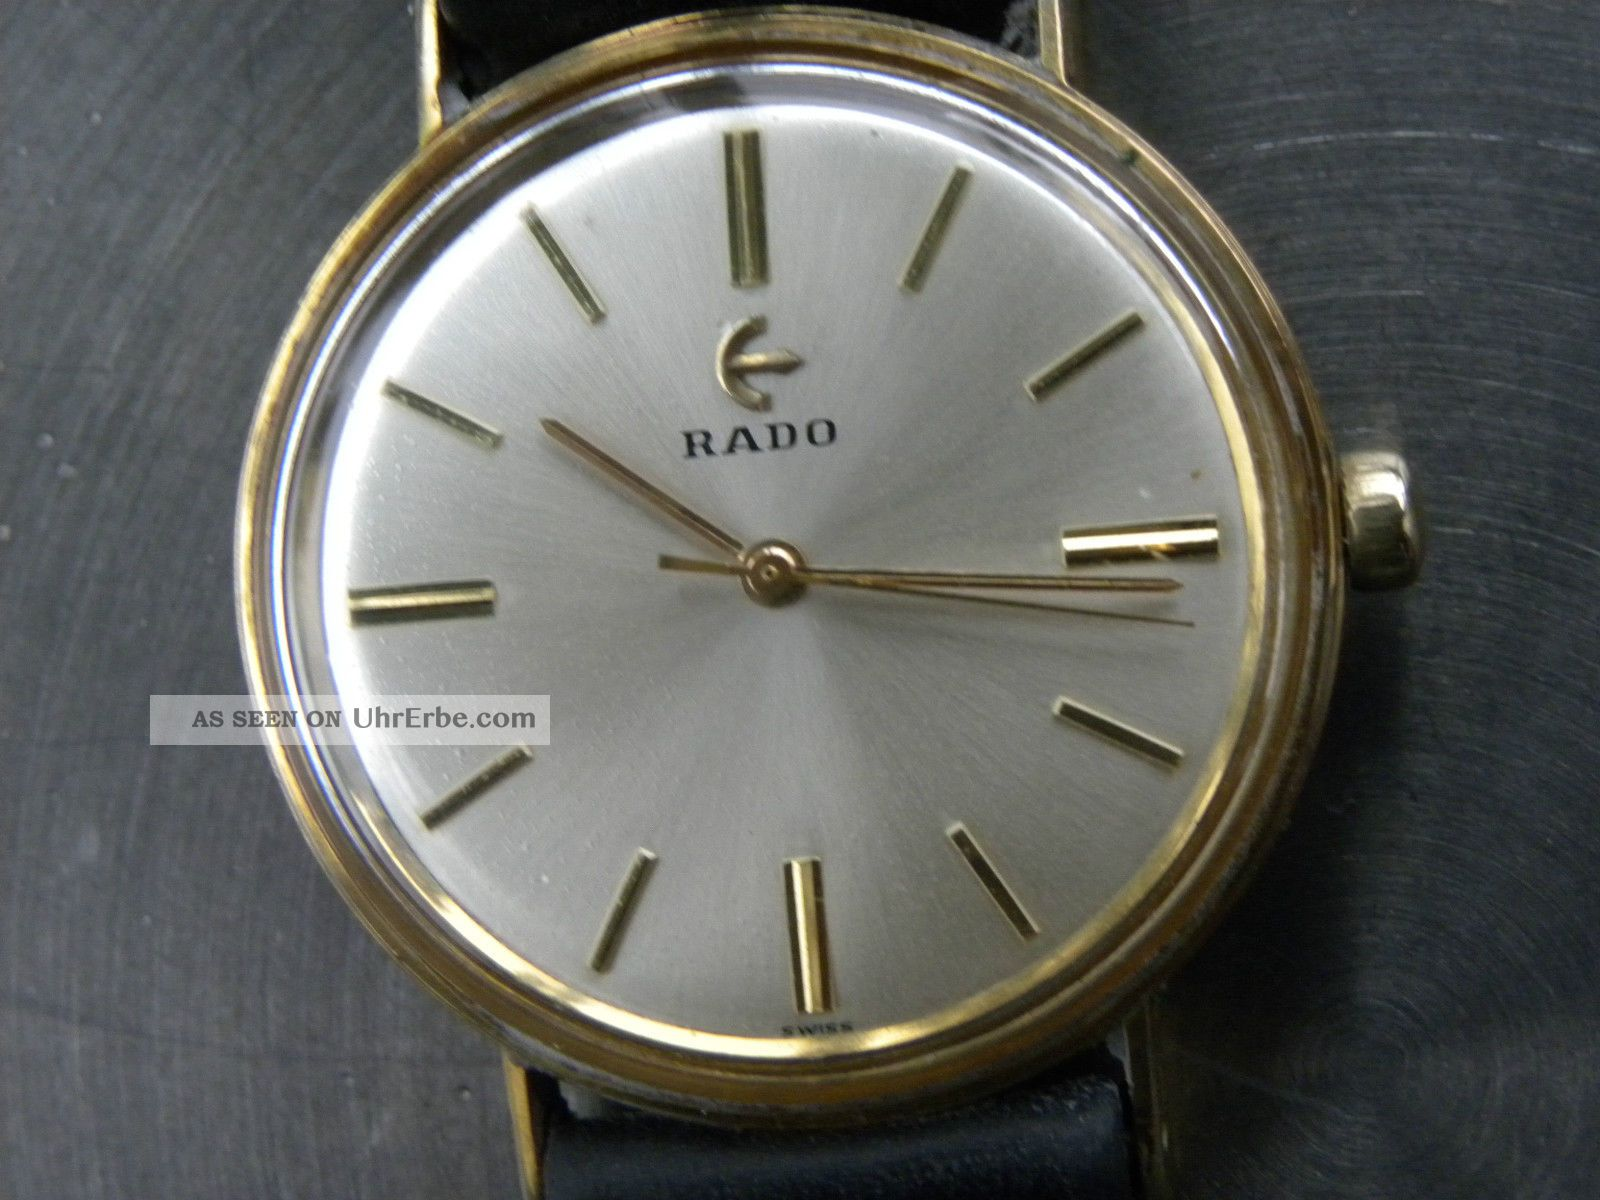 Gepflegte Rado Handaufzug Armbanduhren Bild